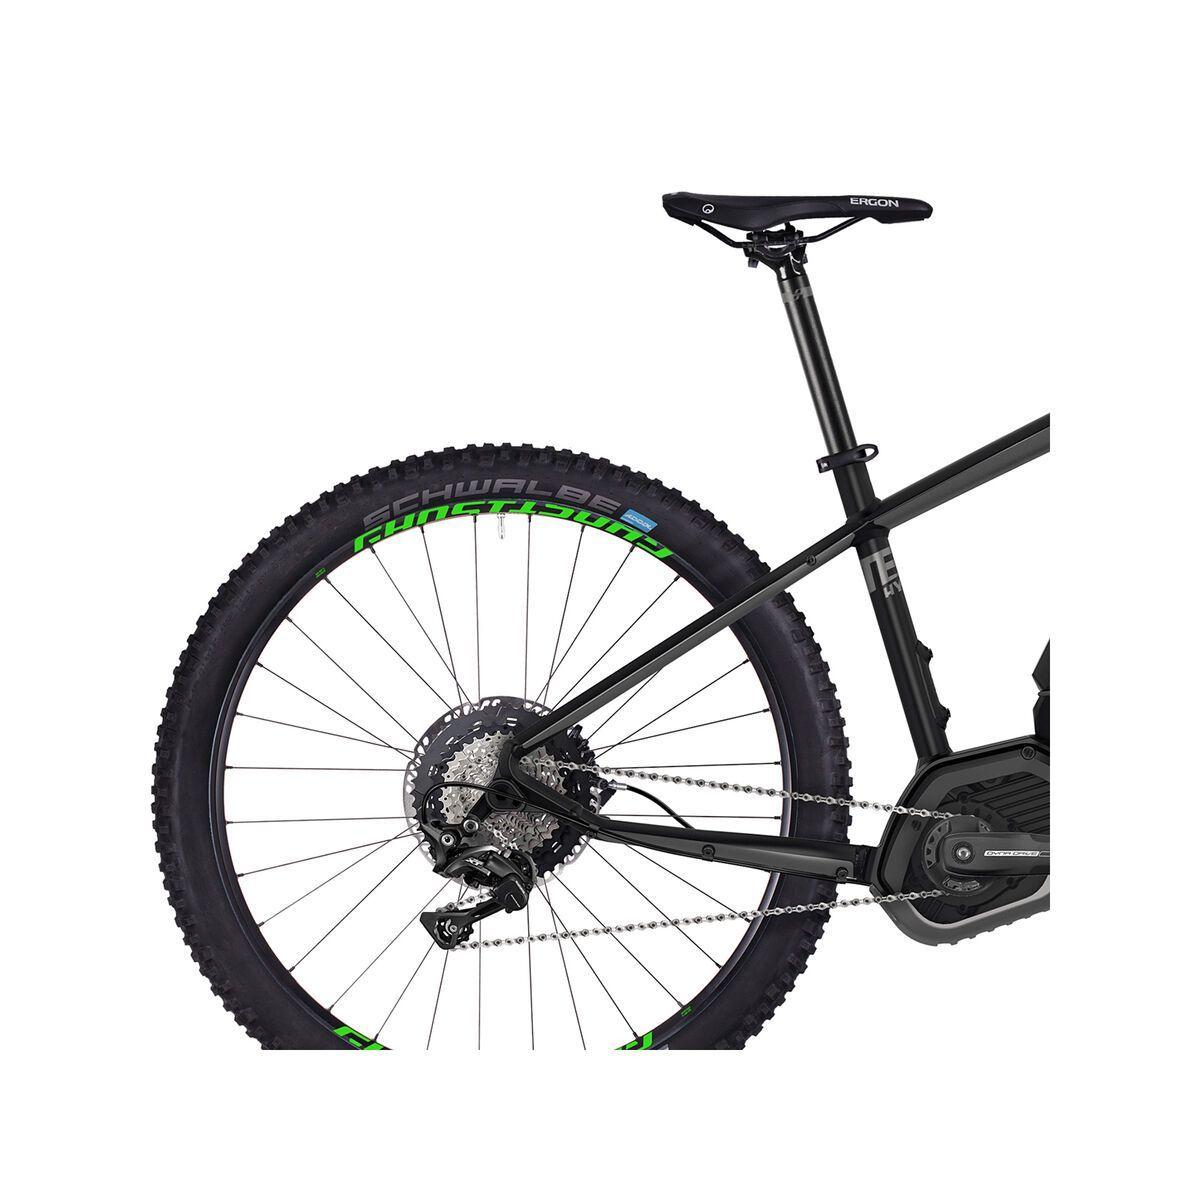 Ghost Hybride Teru B7.7+ AL, black/gray/neon green   Bild 6